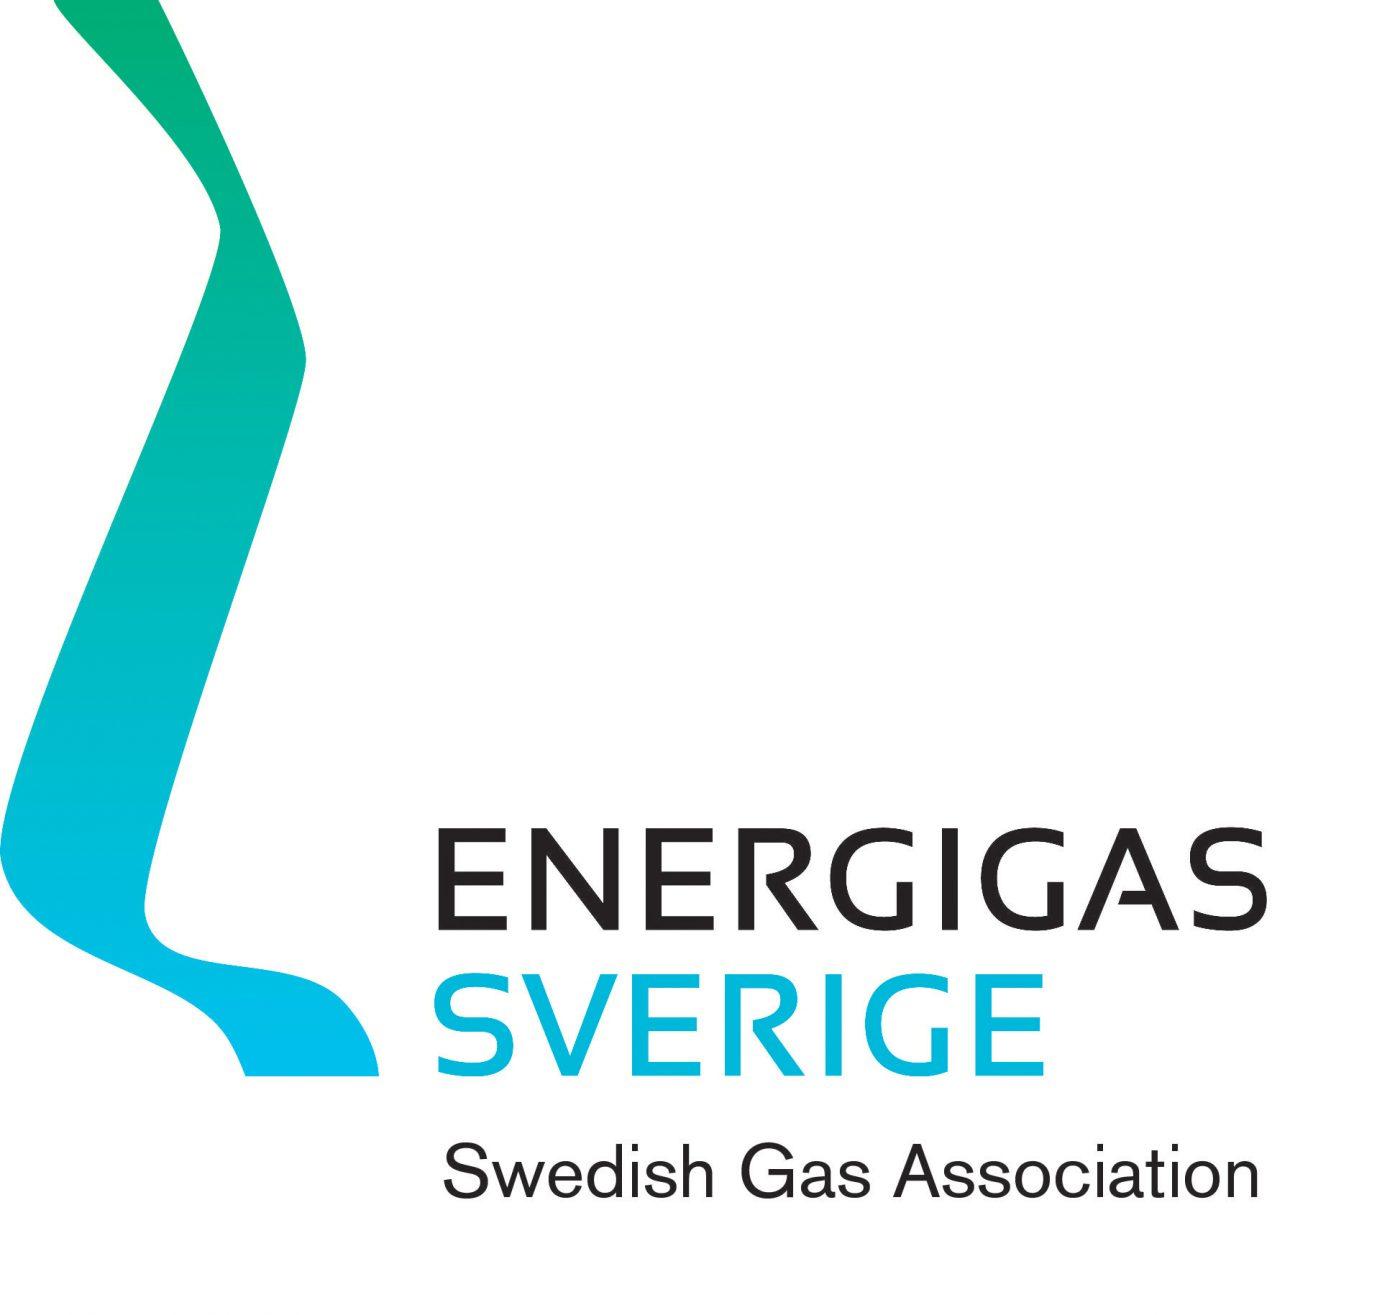 https://www.ngva.eu/wp-content/uploads/2018/03/114-Energigas-Sverige-1400x1315.jpg